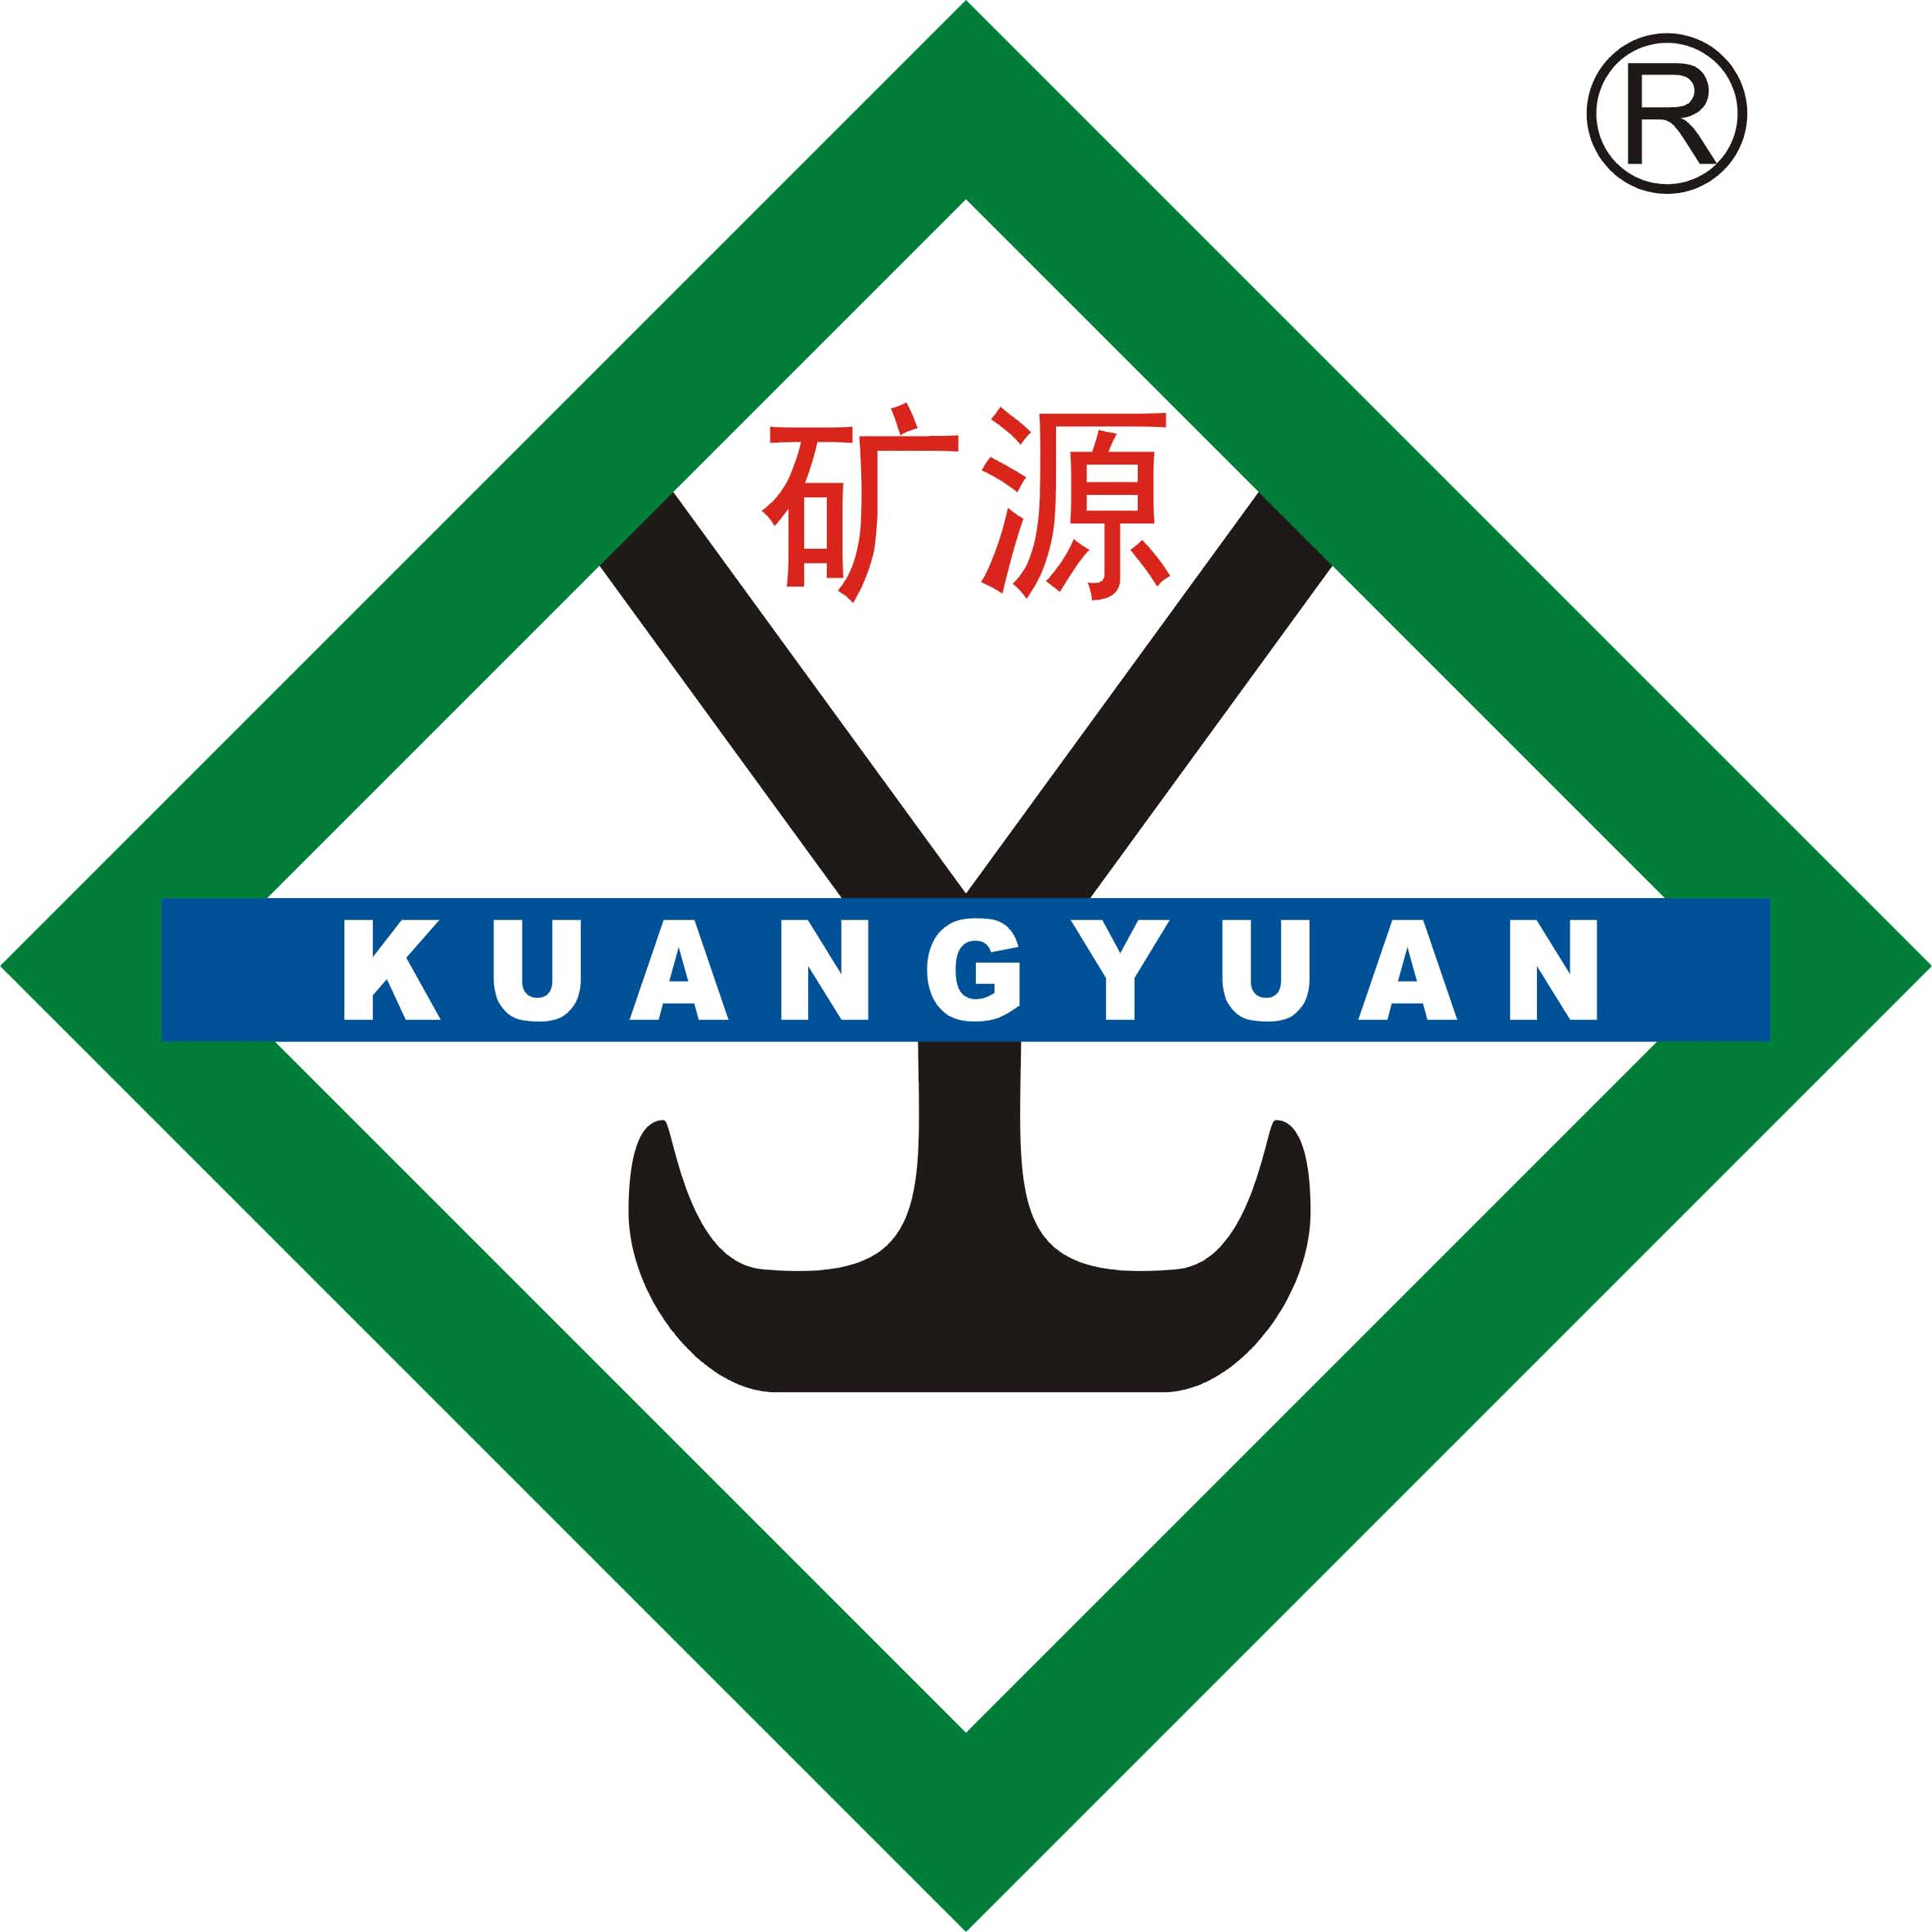 Logo含义